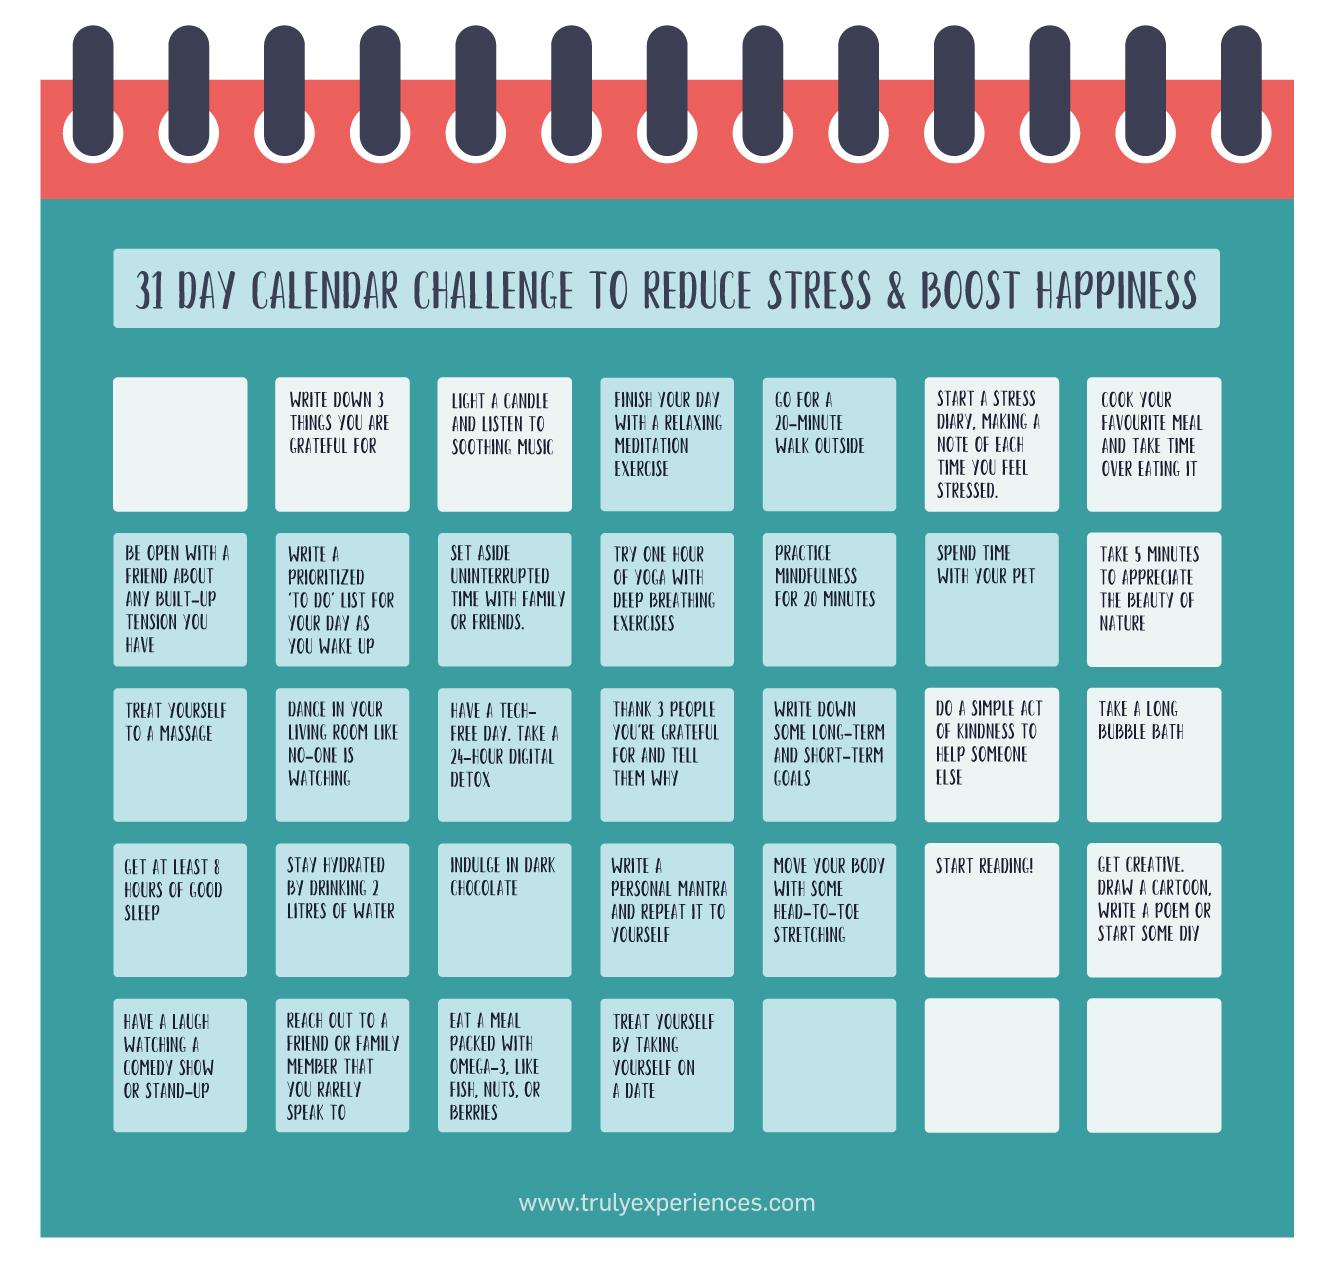 31 Day Calendar Challenge to Reduce Stress